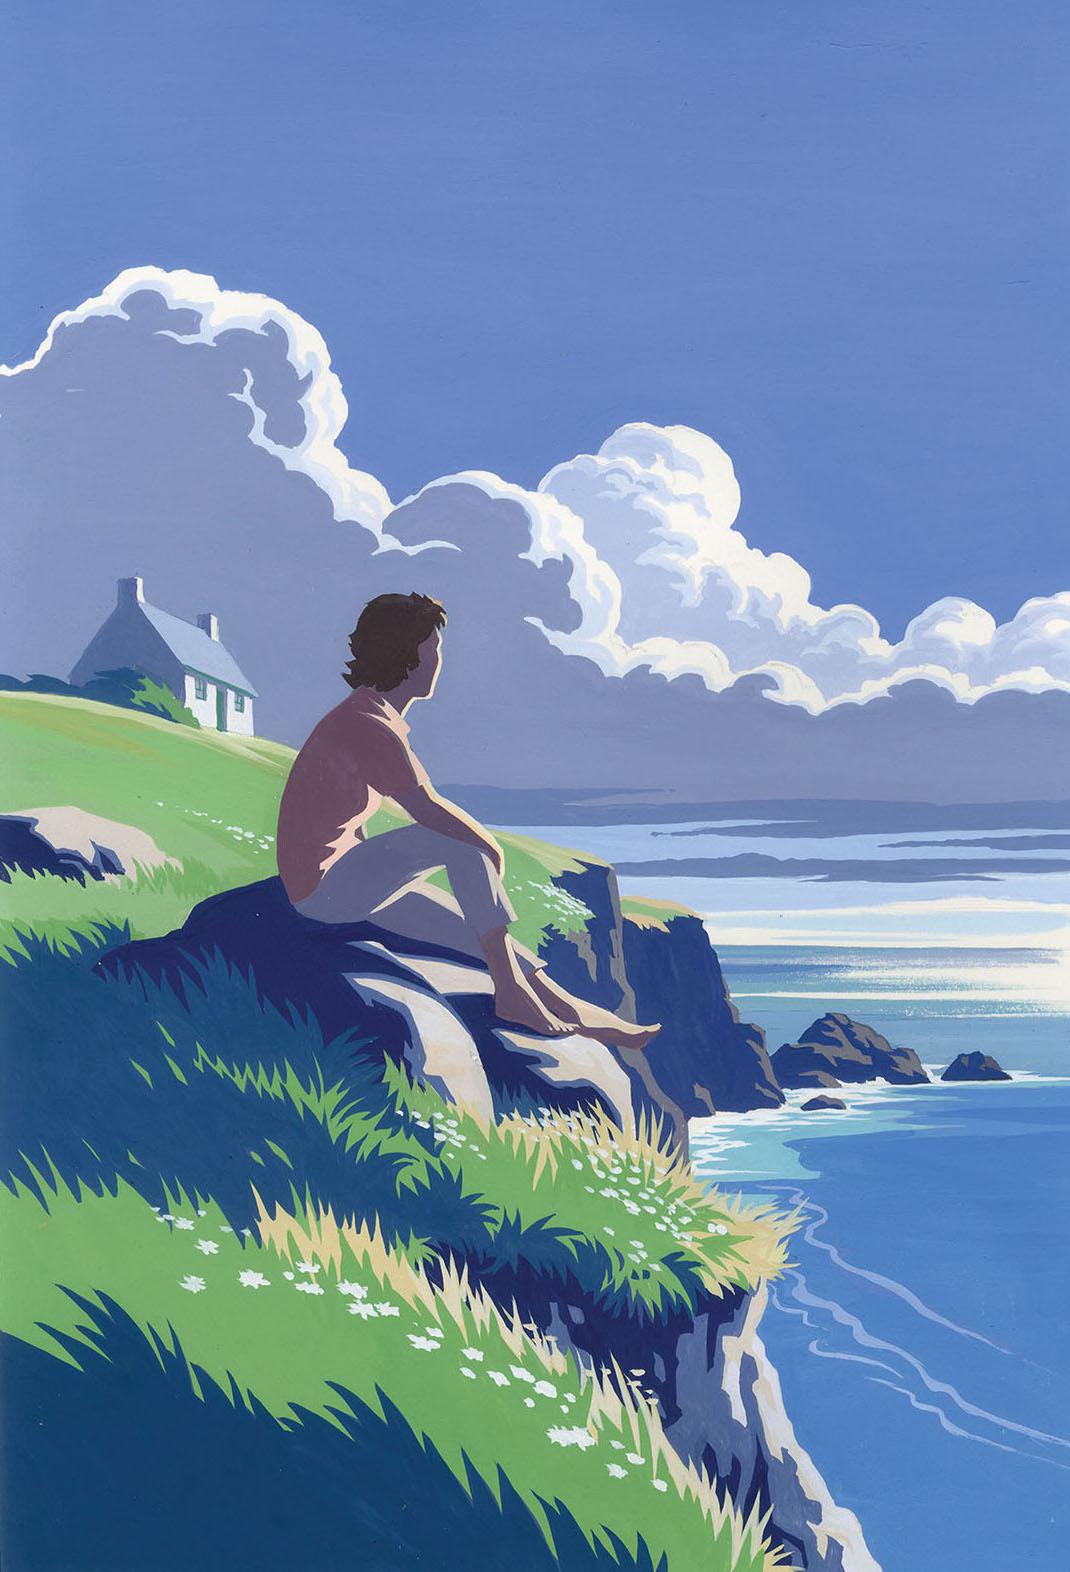 Andrew Davidson Illustrator At The Artworks Illustration